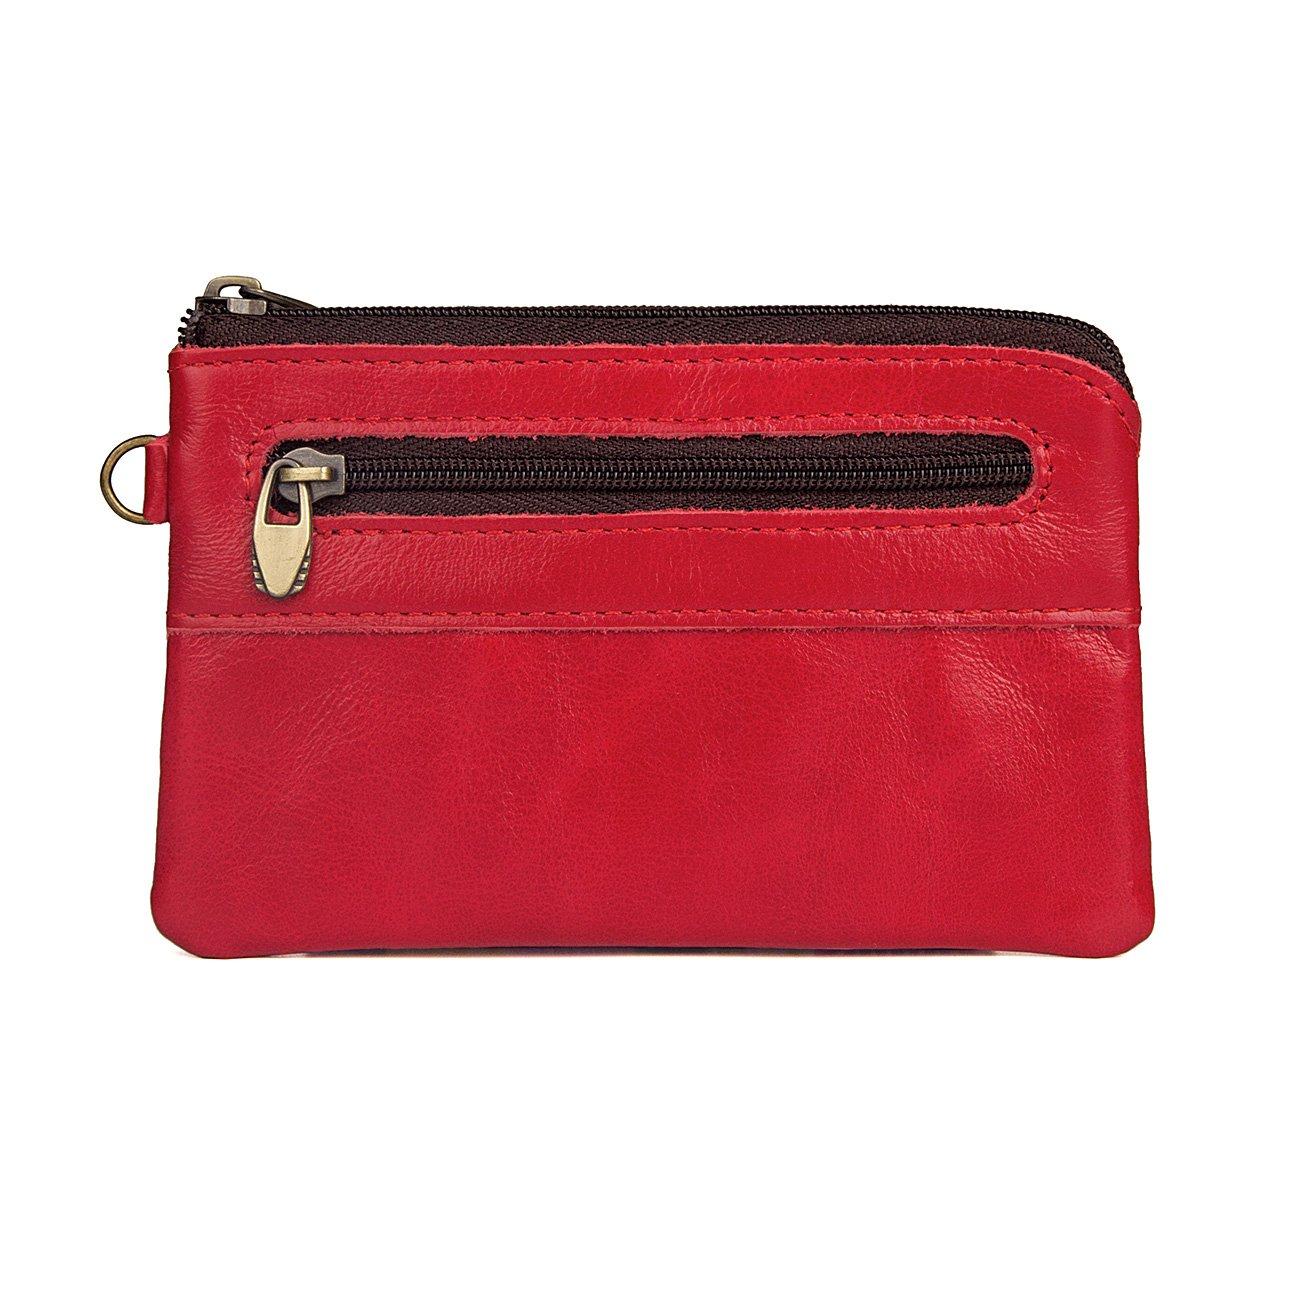 Womens Genuine Leather Zipper Mini Coin Purse change pocket